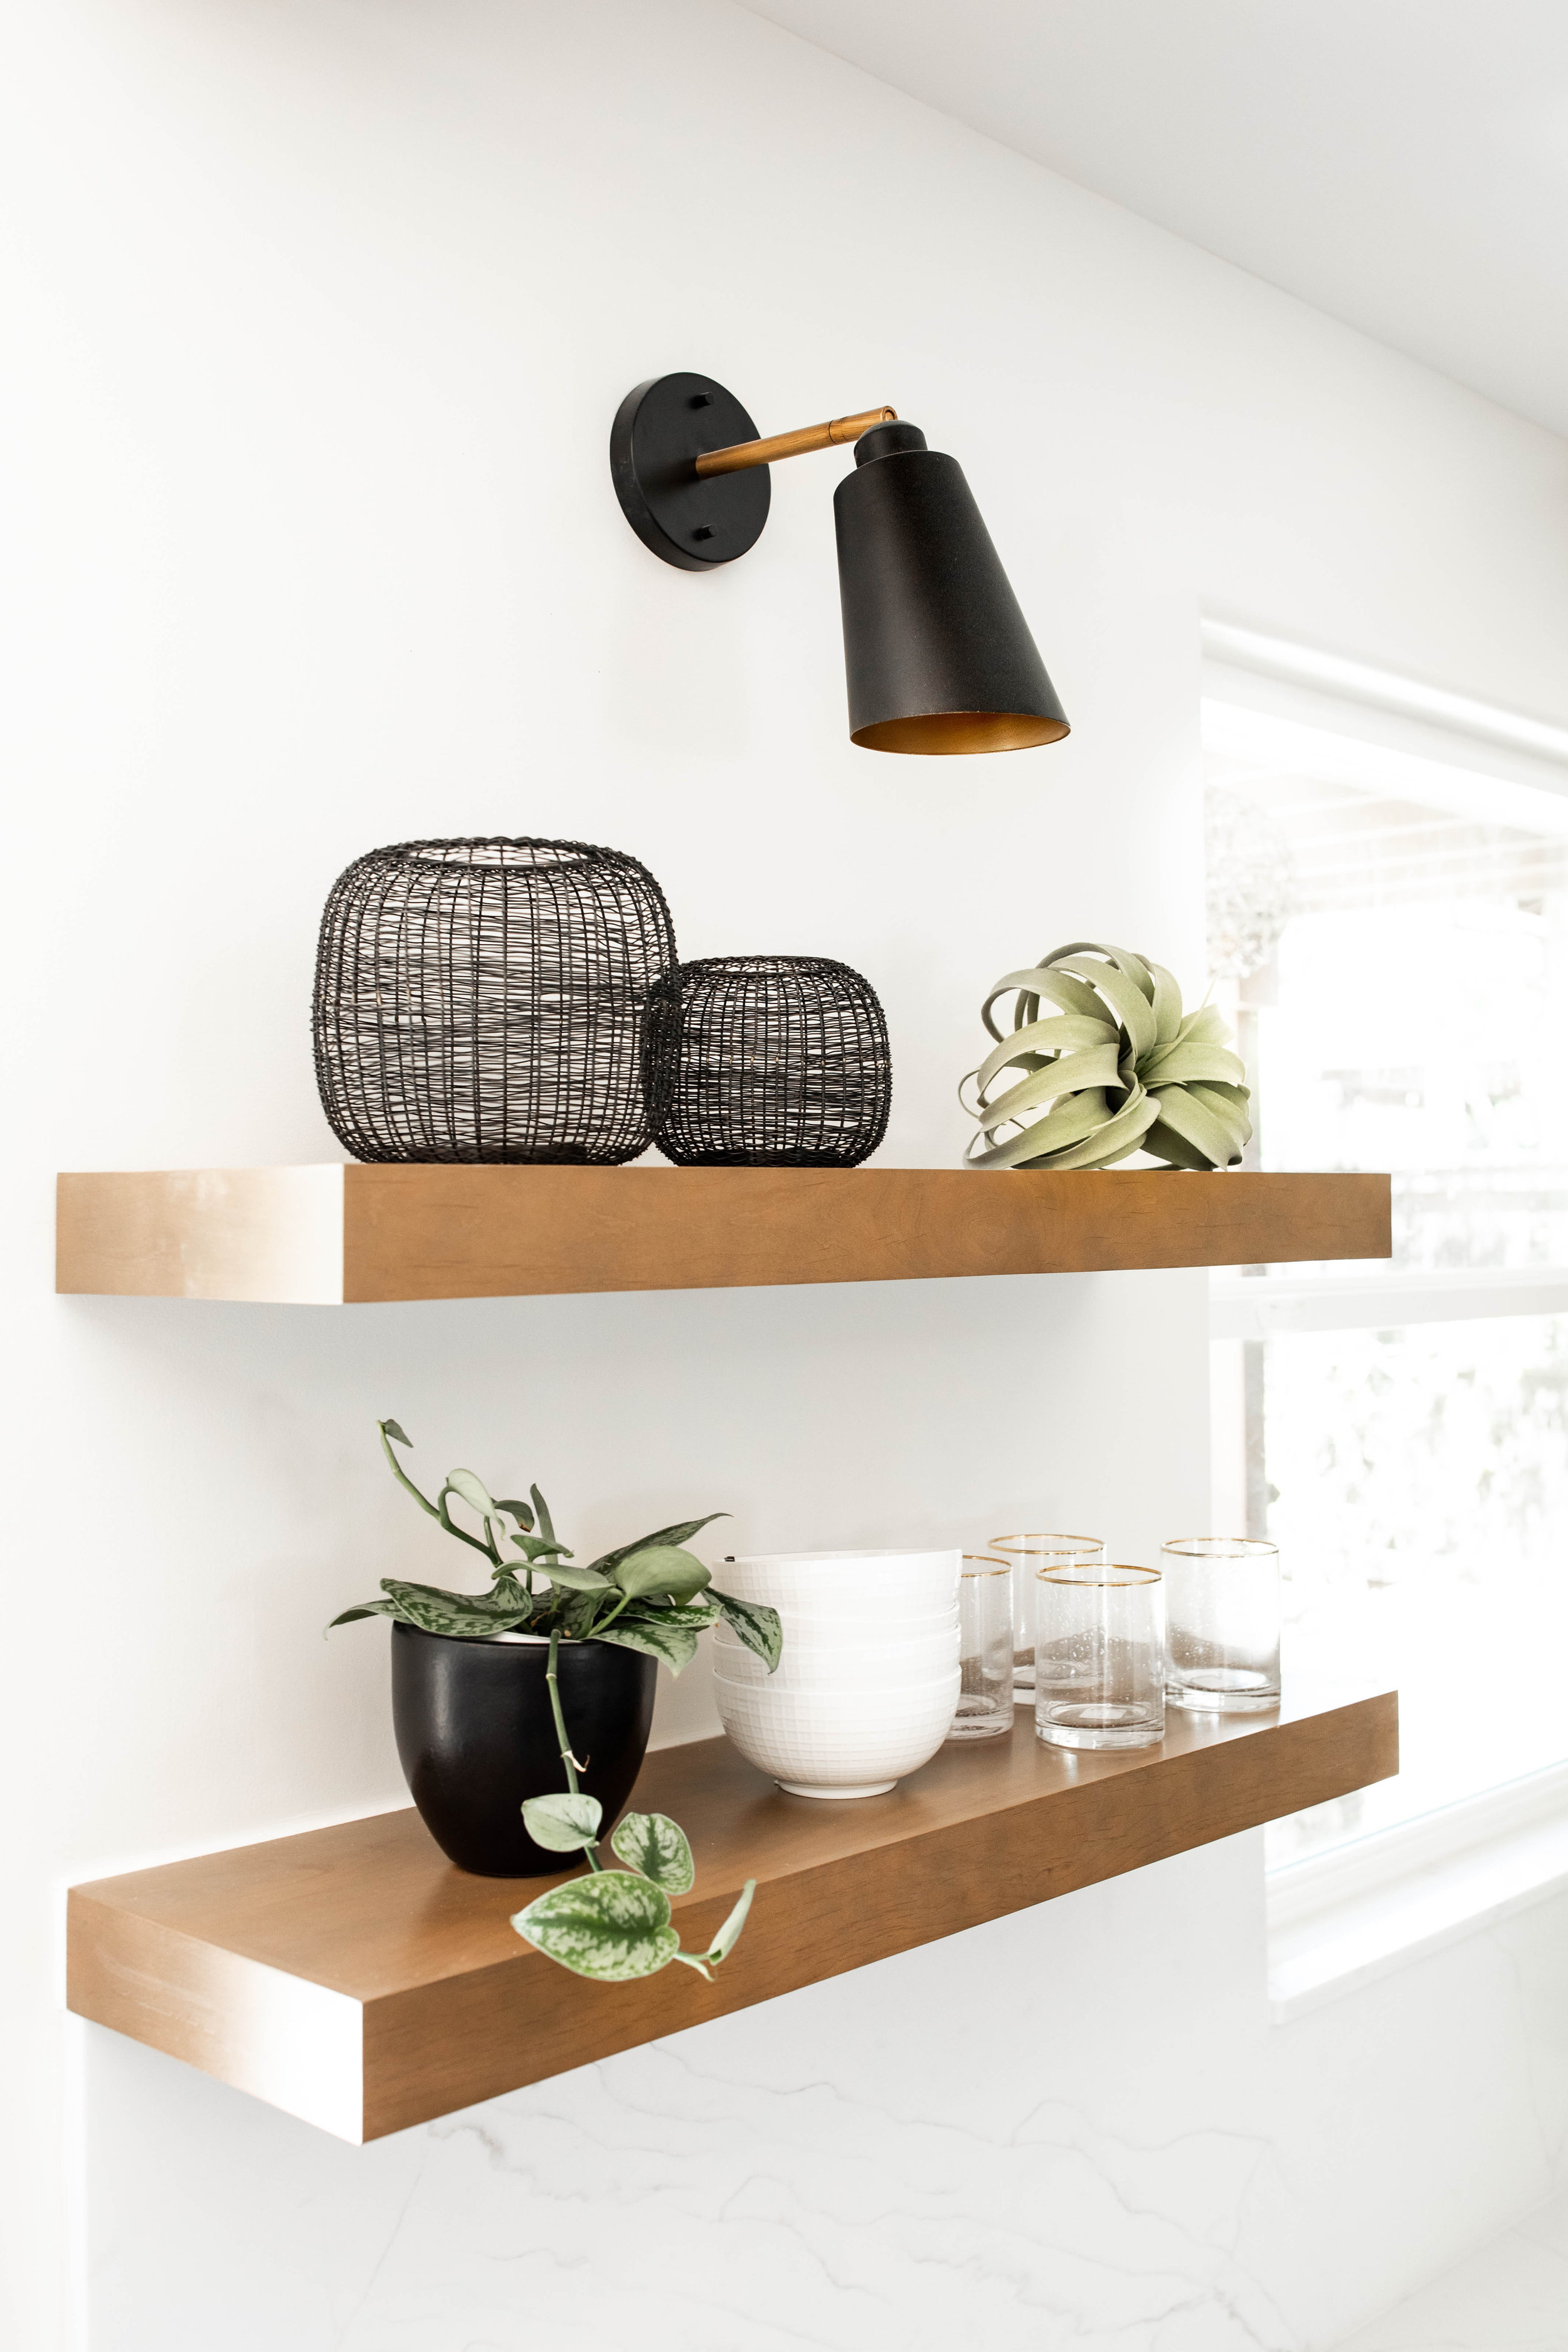 Morgan_Mullen_Design_Blue_Water_San_Diego_Interior_Designer_The_Zamudios-36.jpg